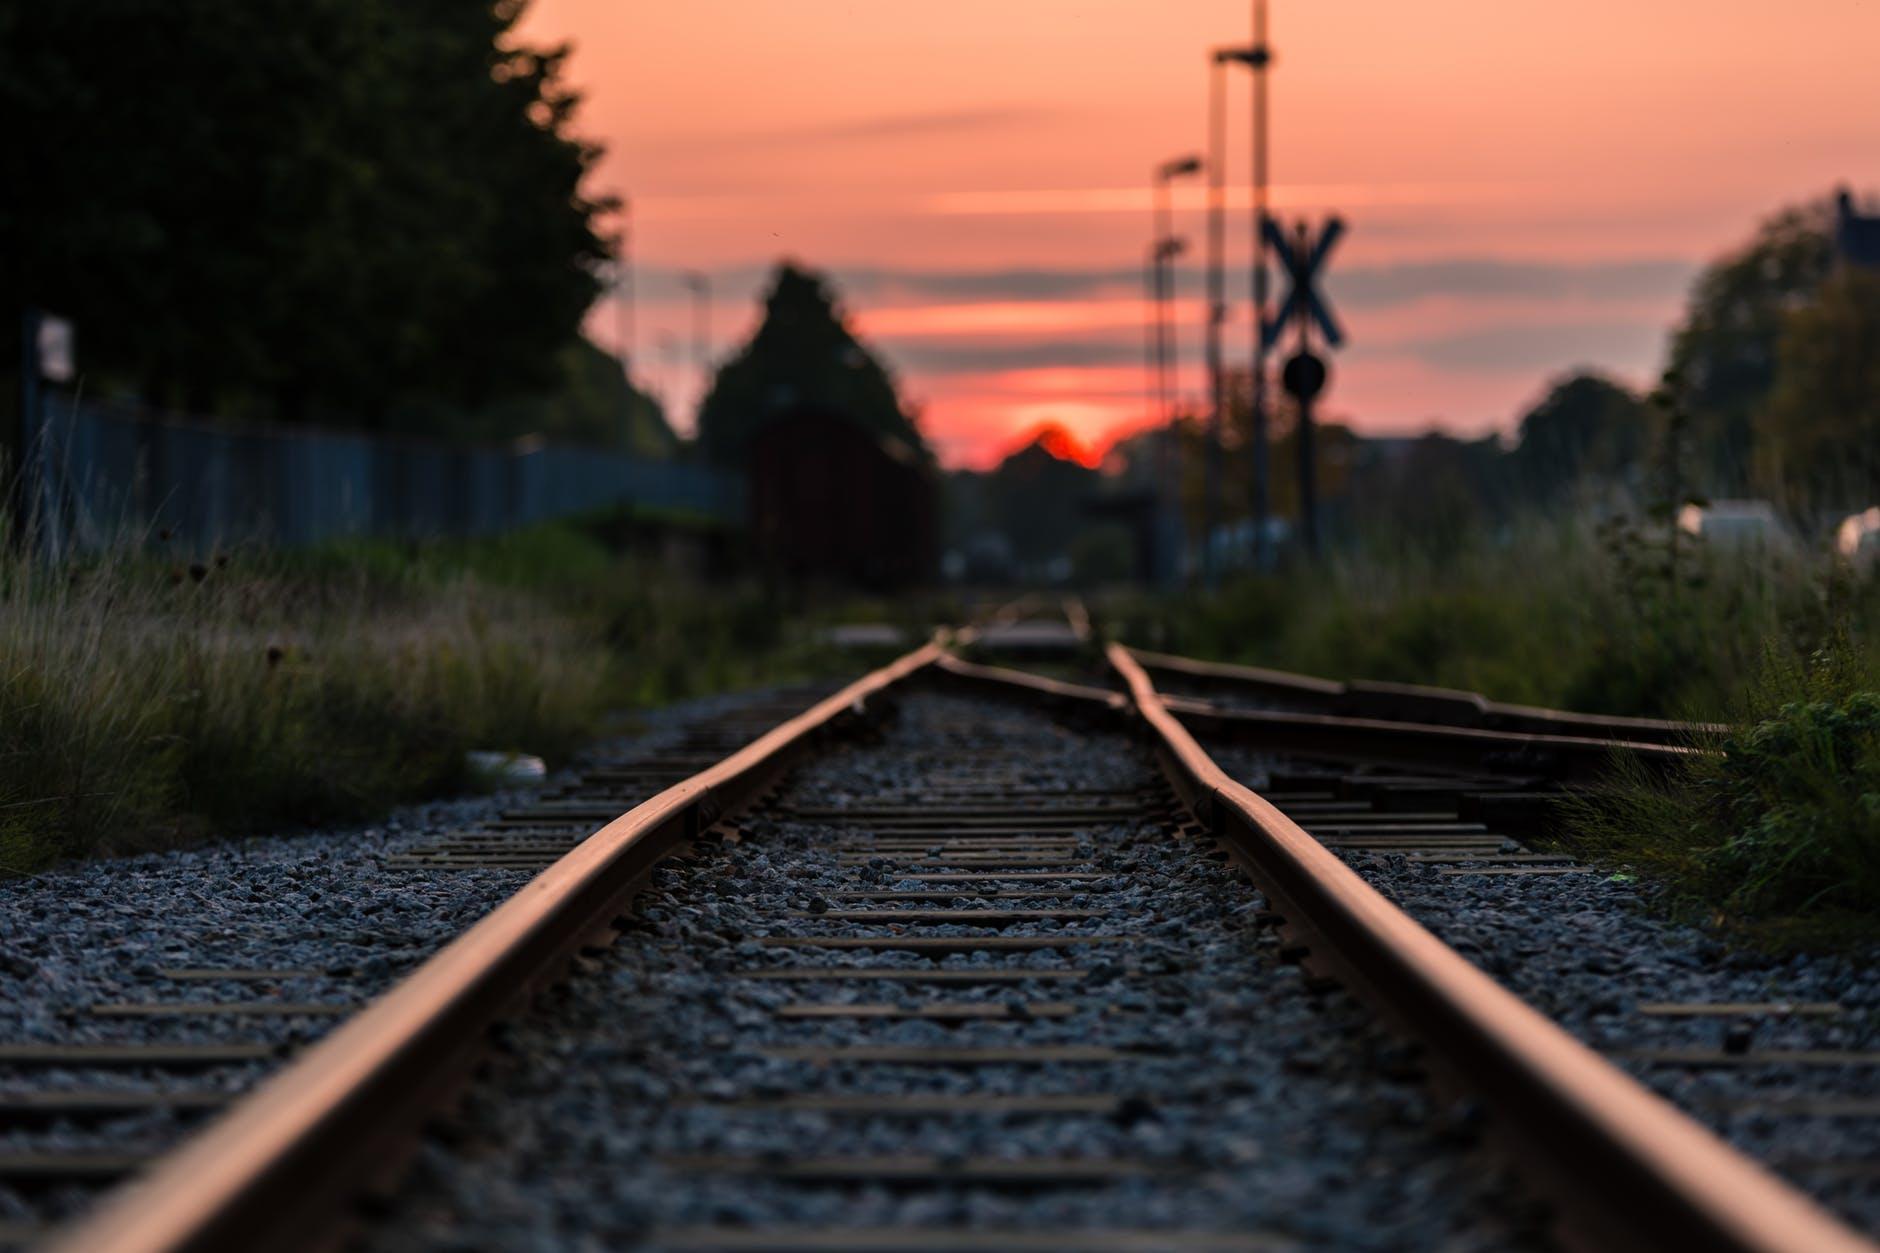 Easing the Transportation Burden for Behavioral Health